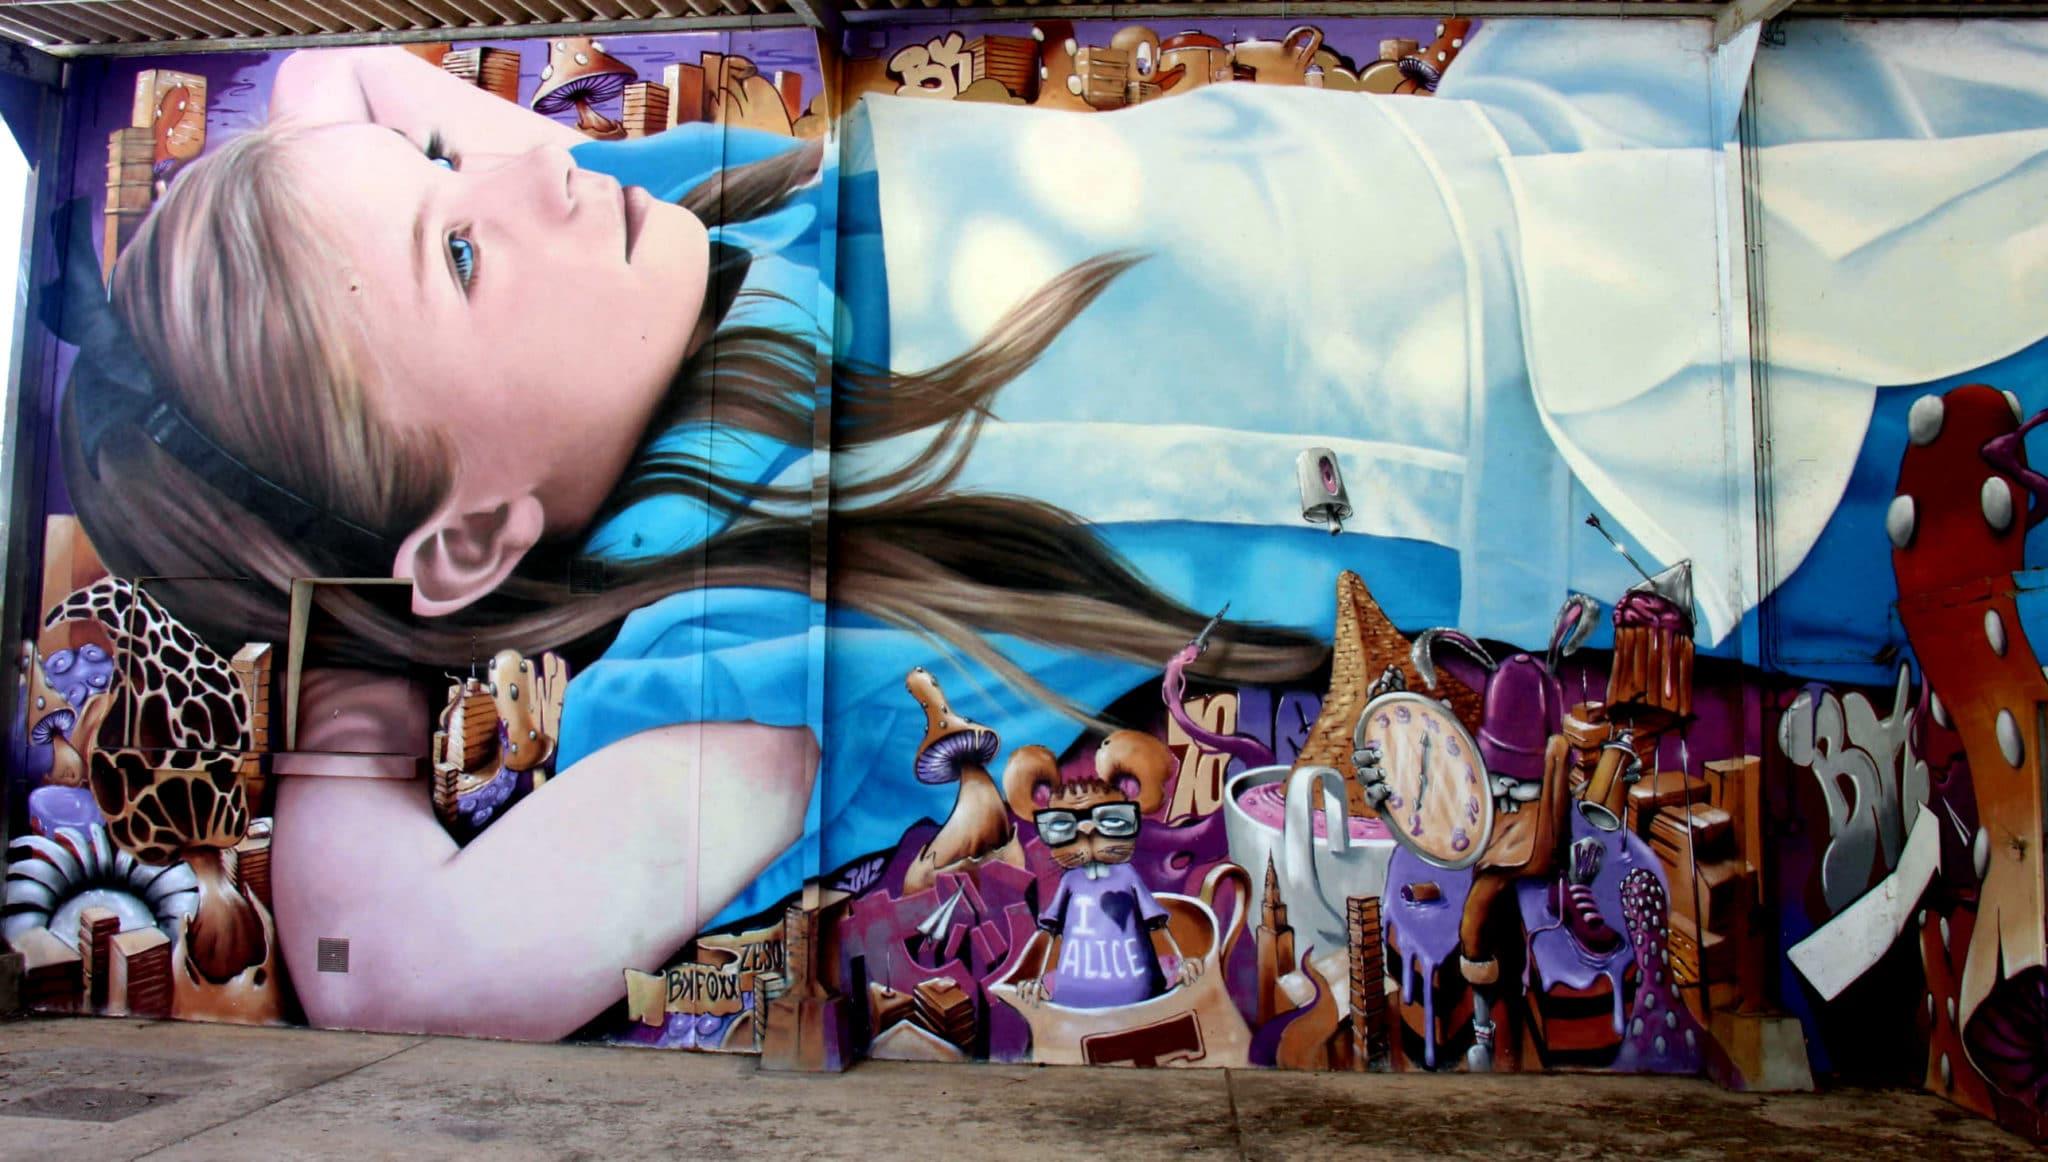 Street art City à Lurcy Lévis